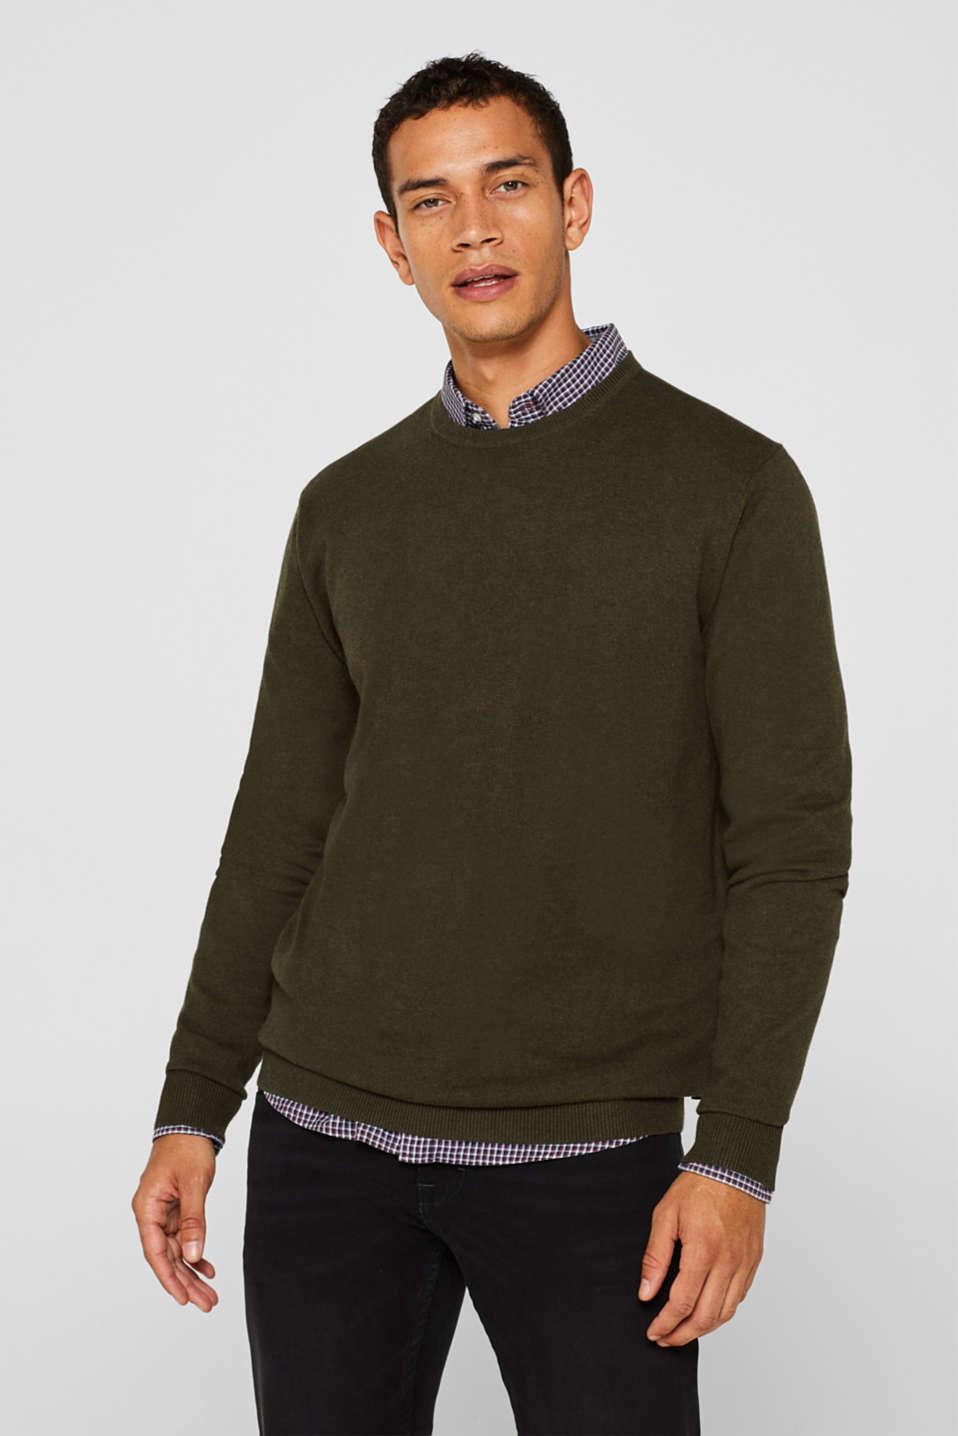 With cashmere: Basic style jumper, DARK KHAKI, detail image number 0